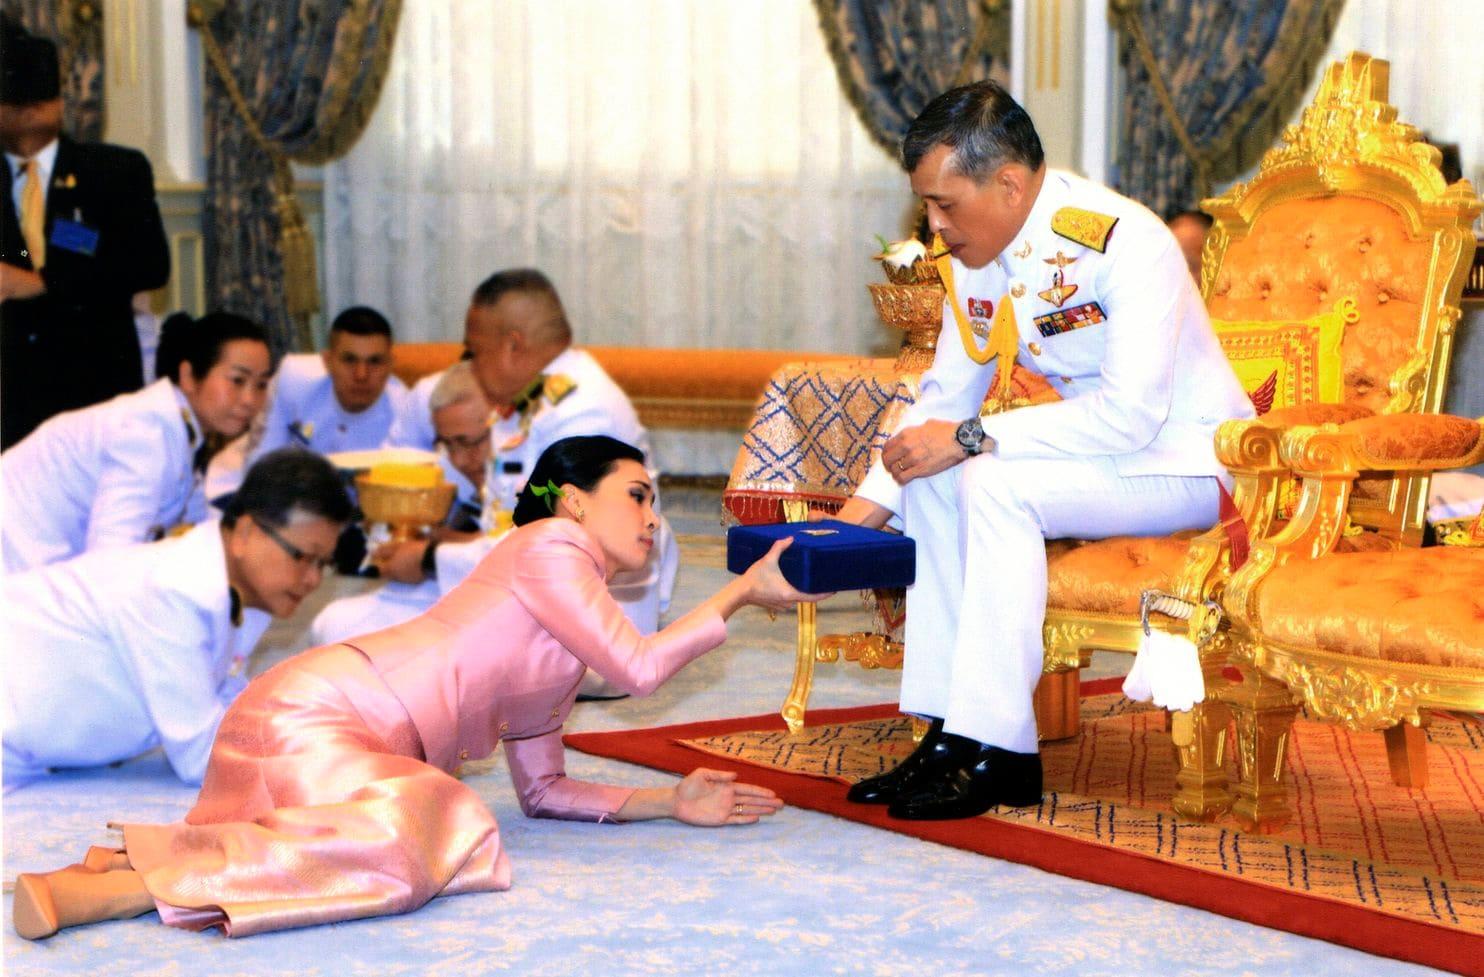 Matrimonio Simbolico In Thailandia : Suthida la nuova regina thailandese al fianco di re vajiralongkorn